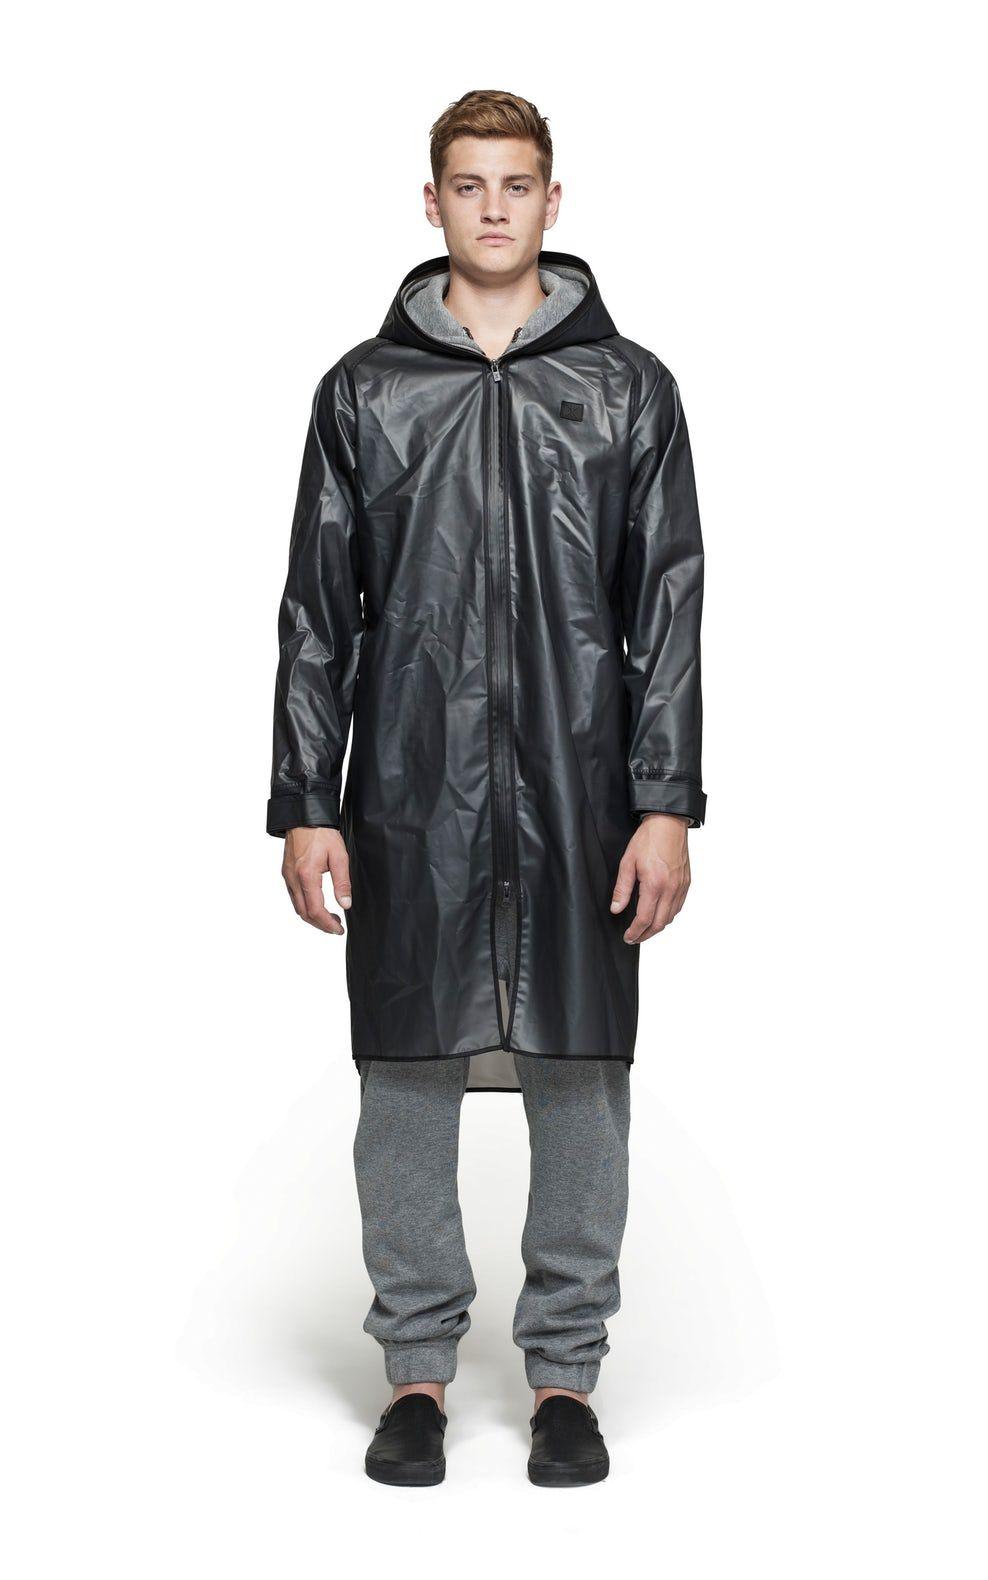 Transparent Pinterest Influence Jacket Black Imper Rain wqF1C